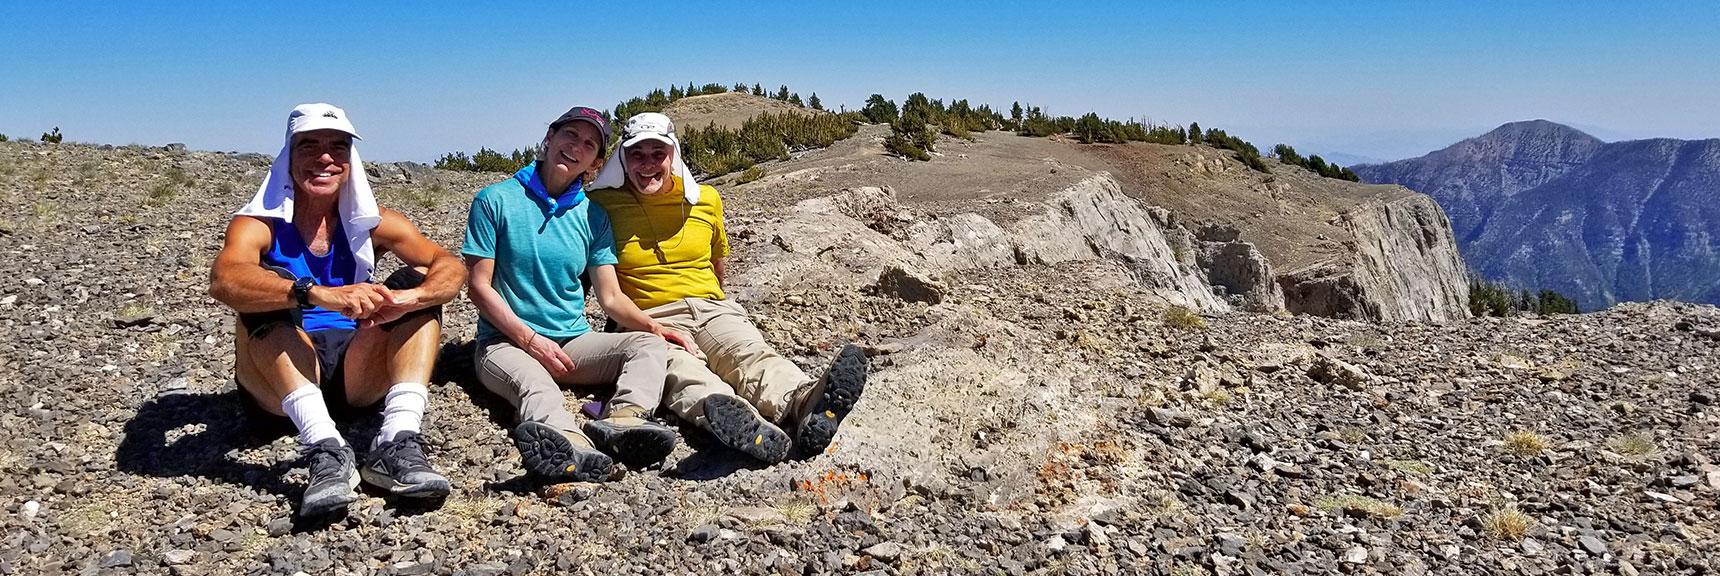 David, Shoshi and Glenn on Mummy Mountain Summit   Mummy Mountain Adventure with Glenn & Shoshi Hall, Spring Mountains Wilderness, Nevada 015